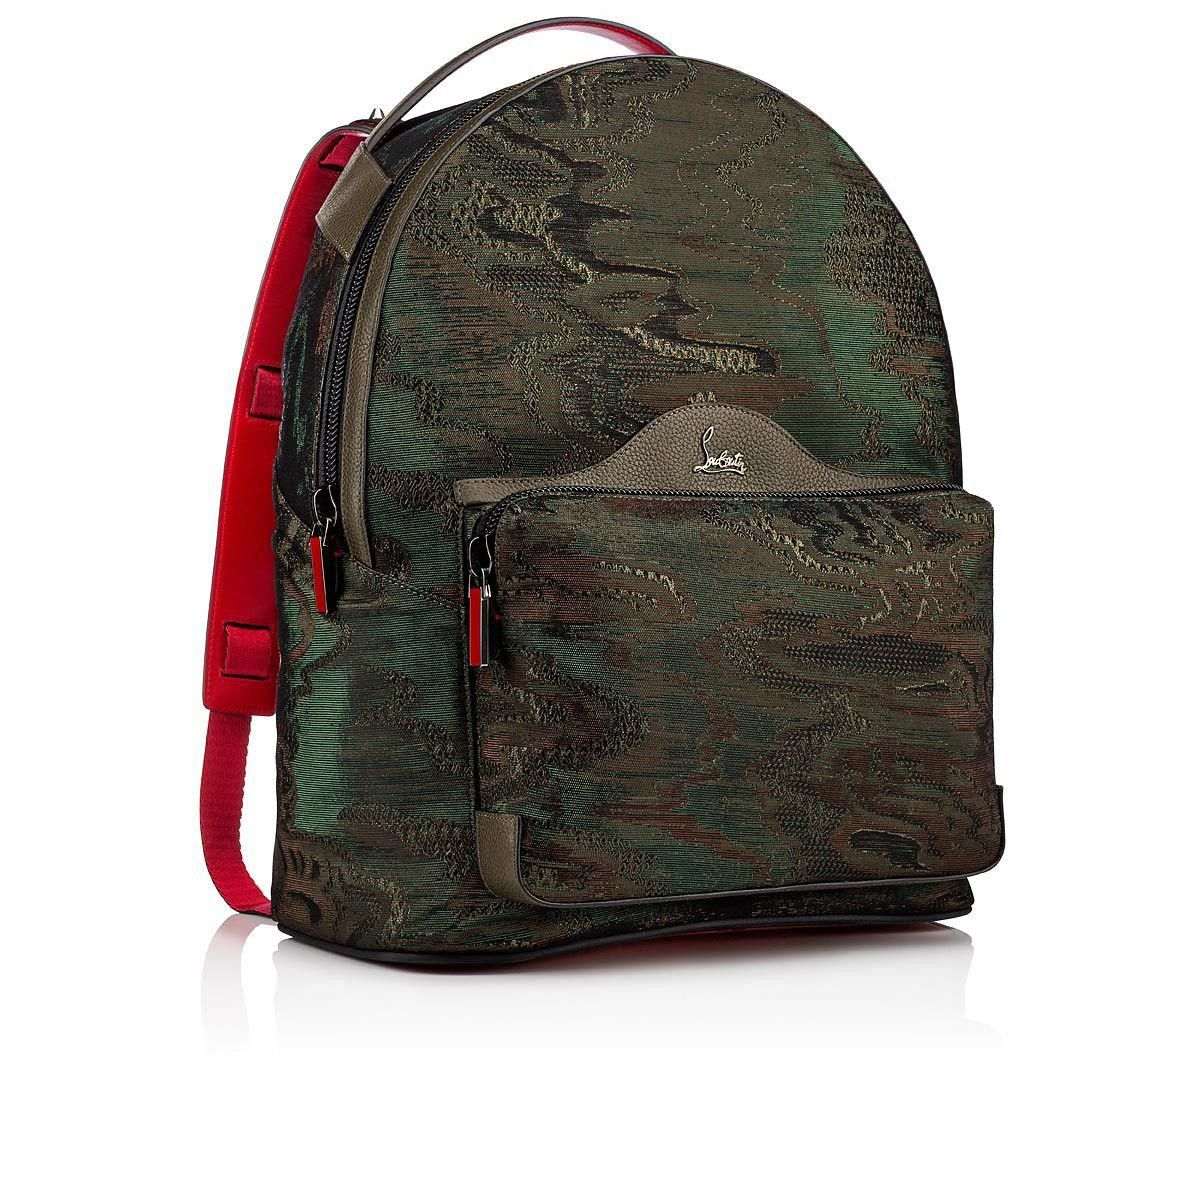 4be437b5128 Bags - Backloubi Backpack - Christian Louboutin #ChristianLouboutin ...